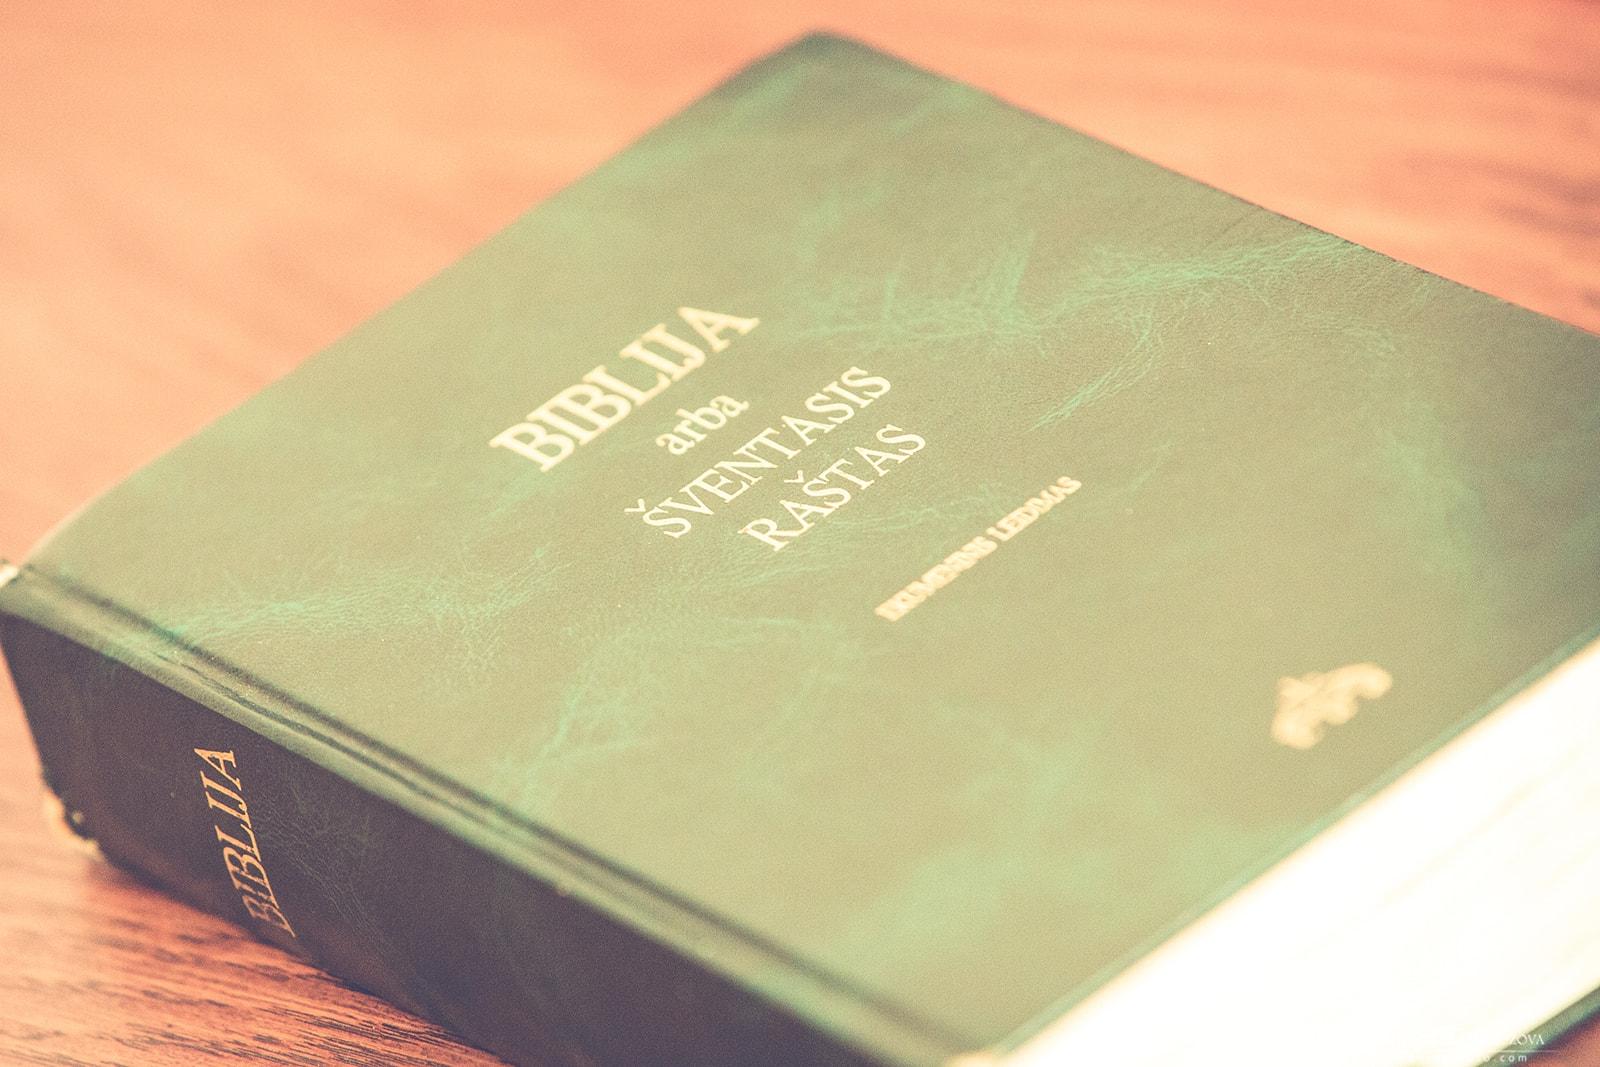 Biblija Šventasis Raštas meninefotografija